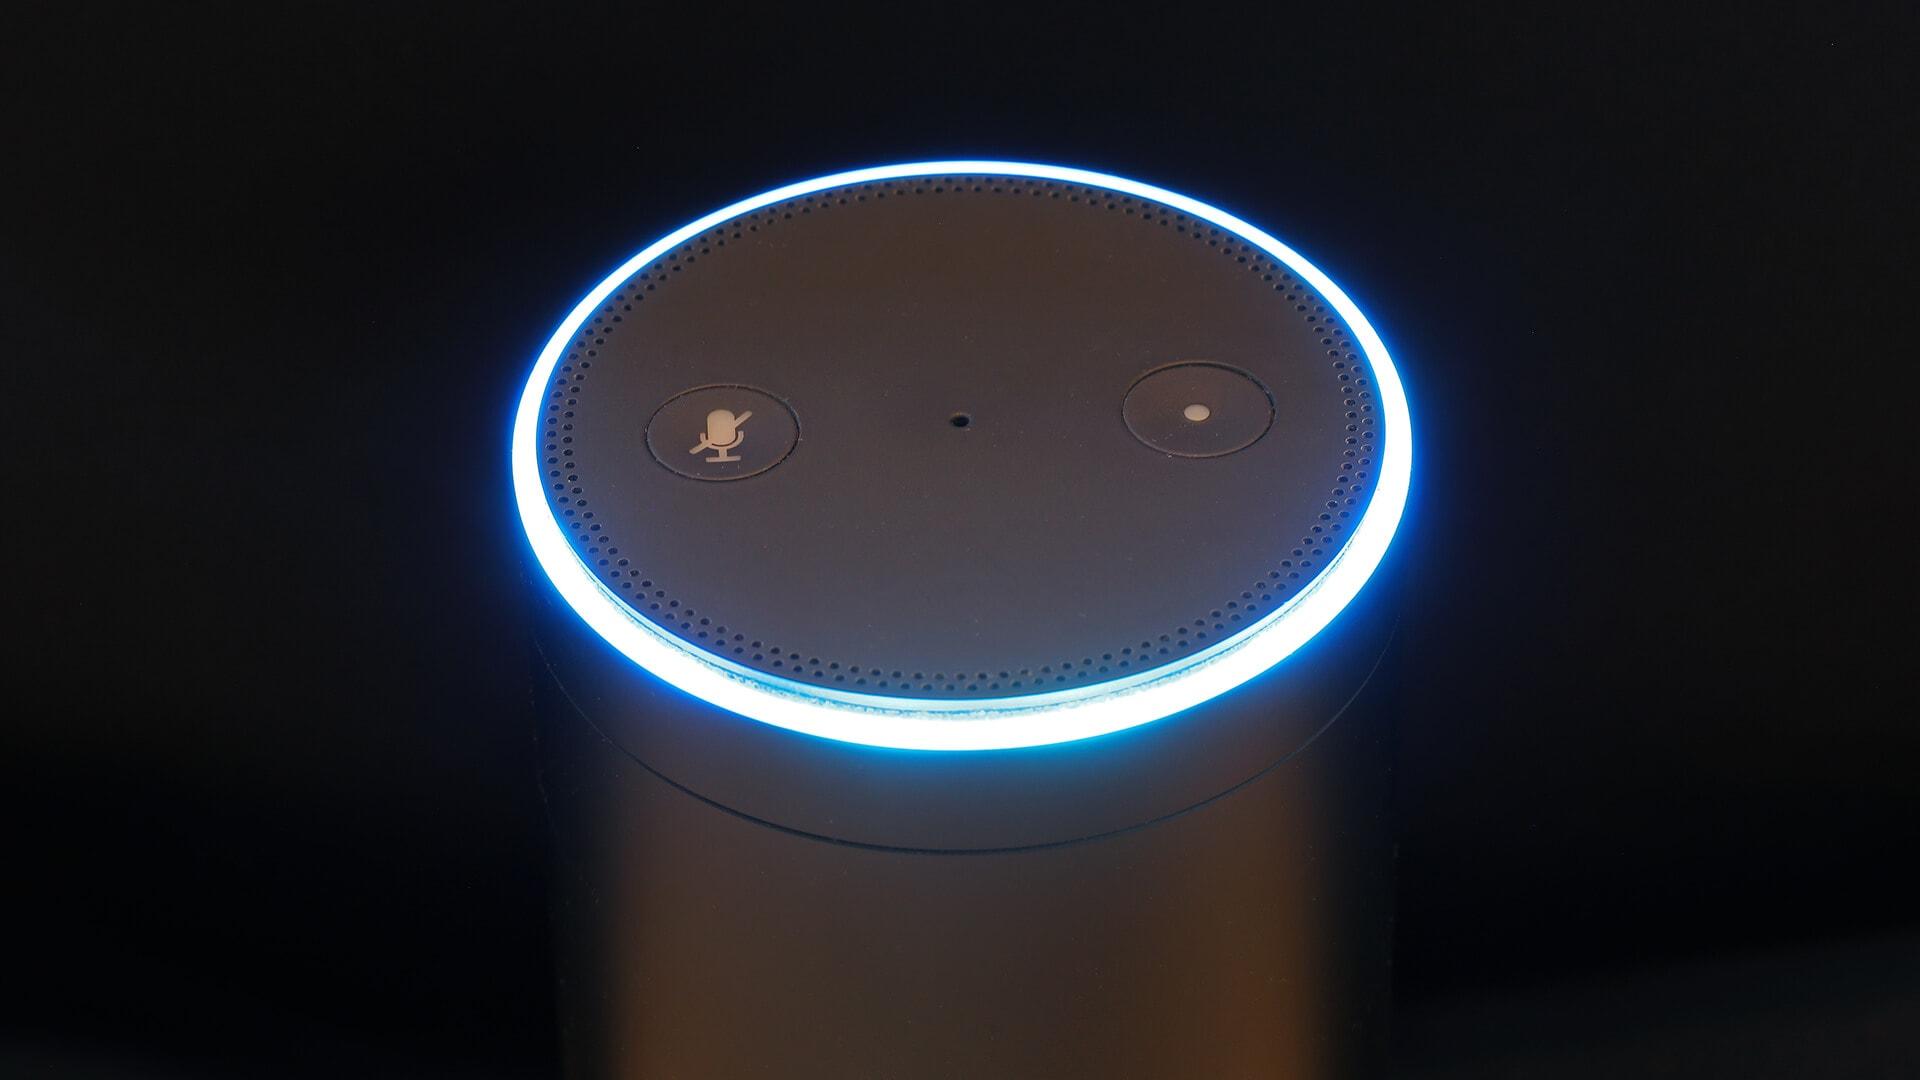 Amazon Echo, housing the Alexa intelligent agent